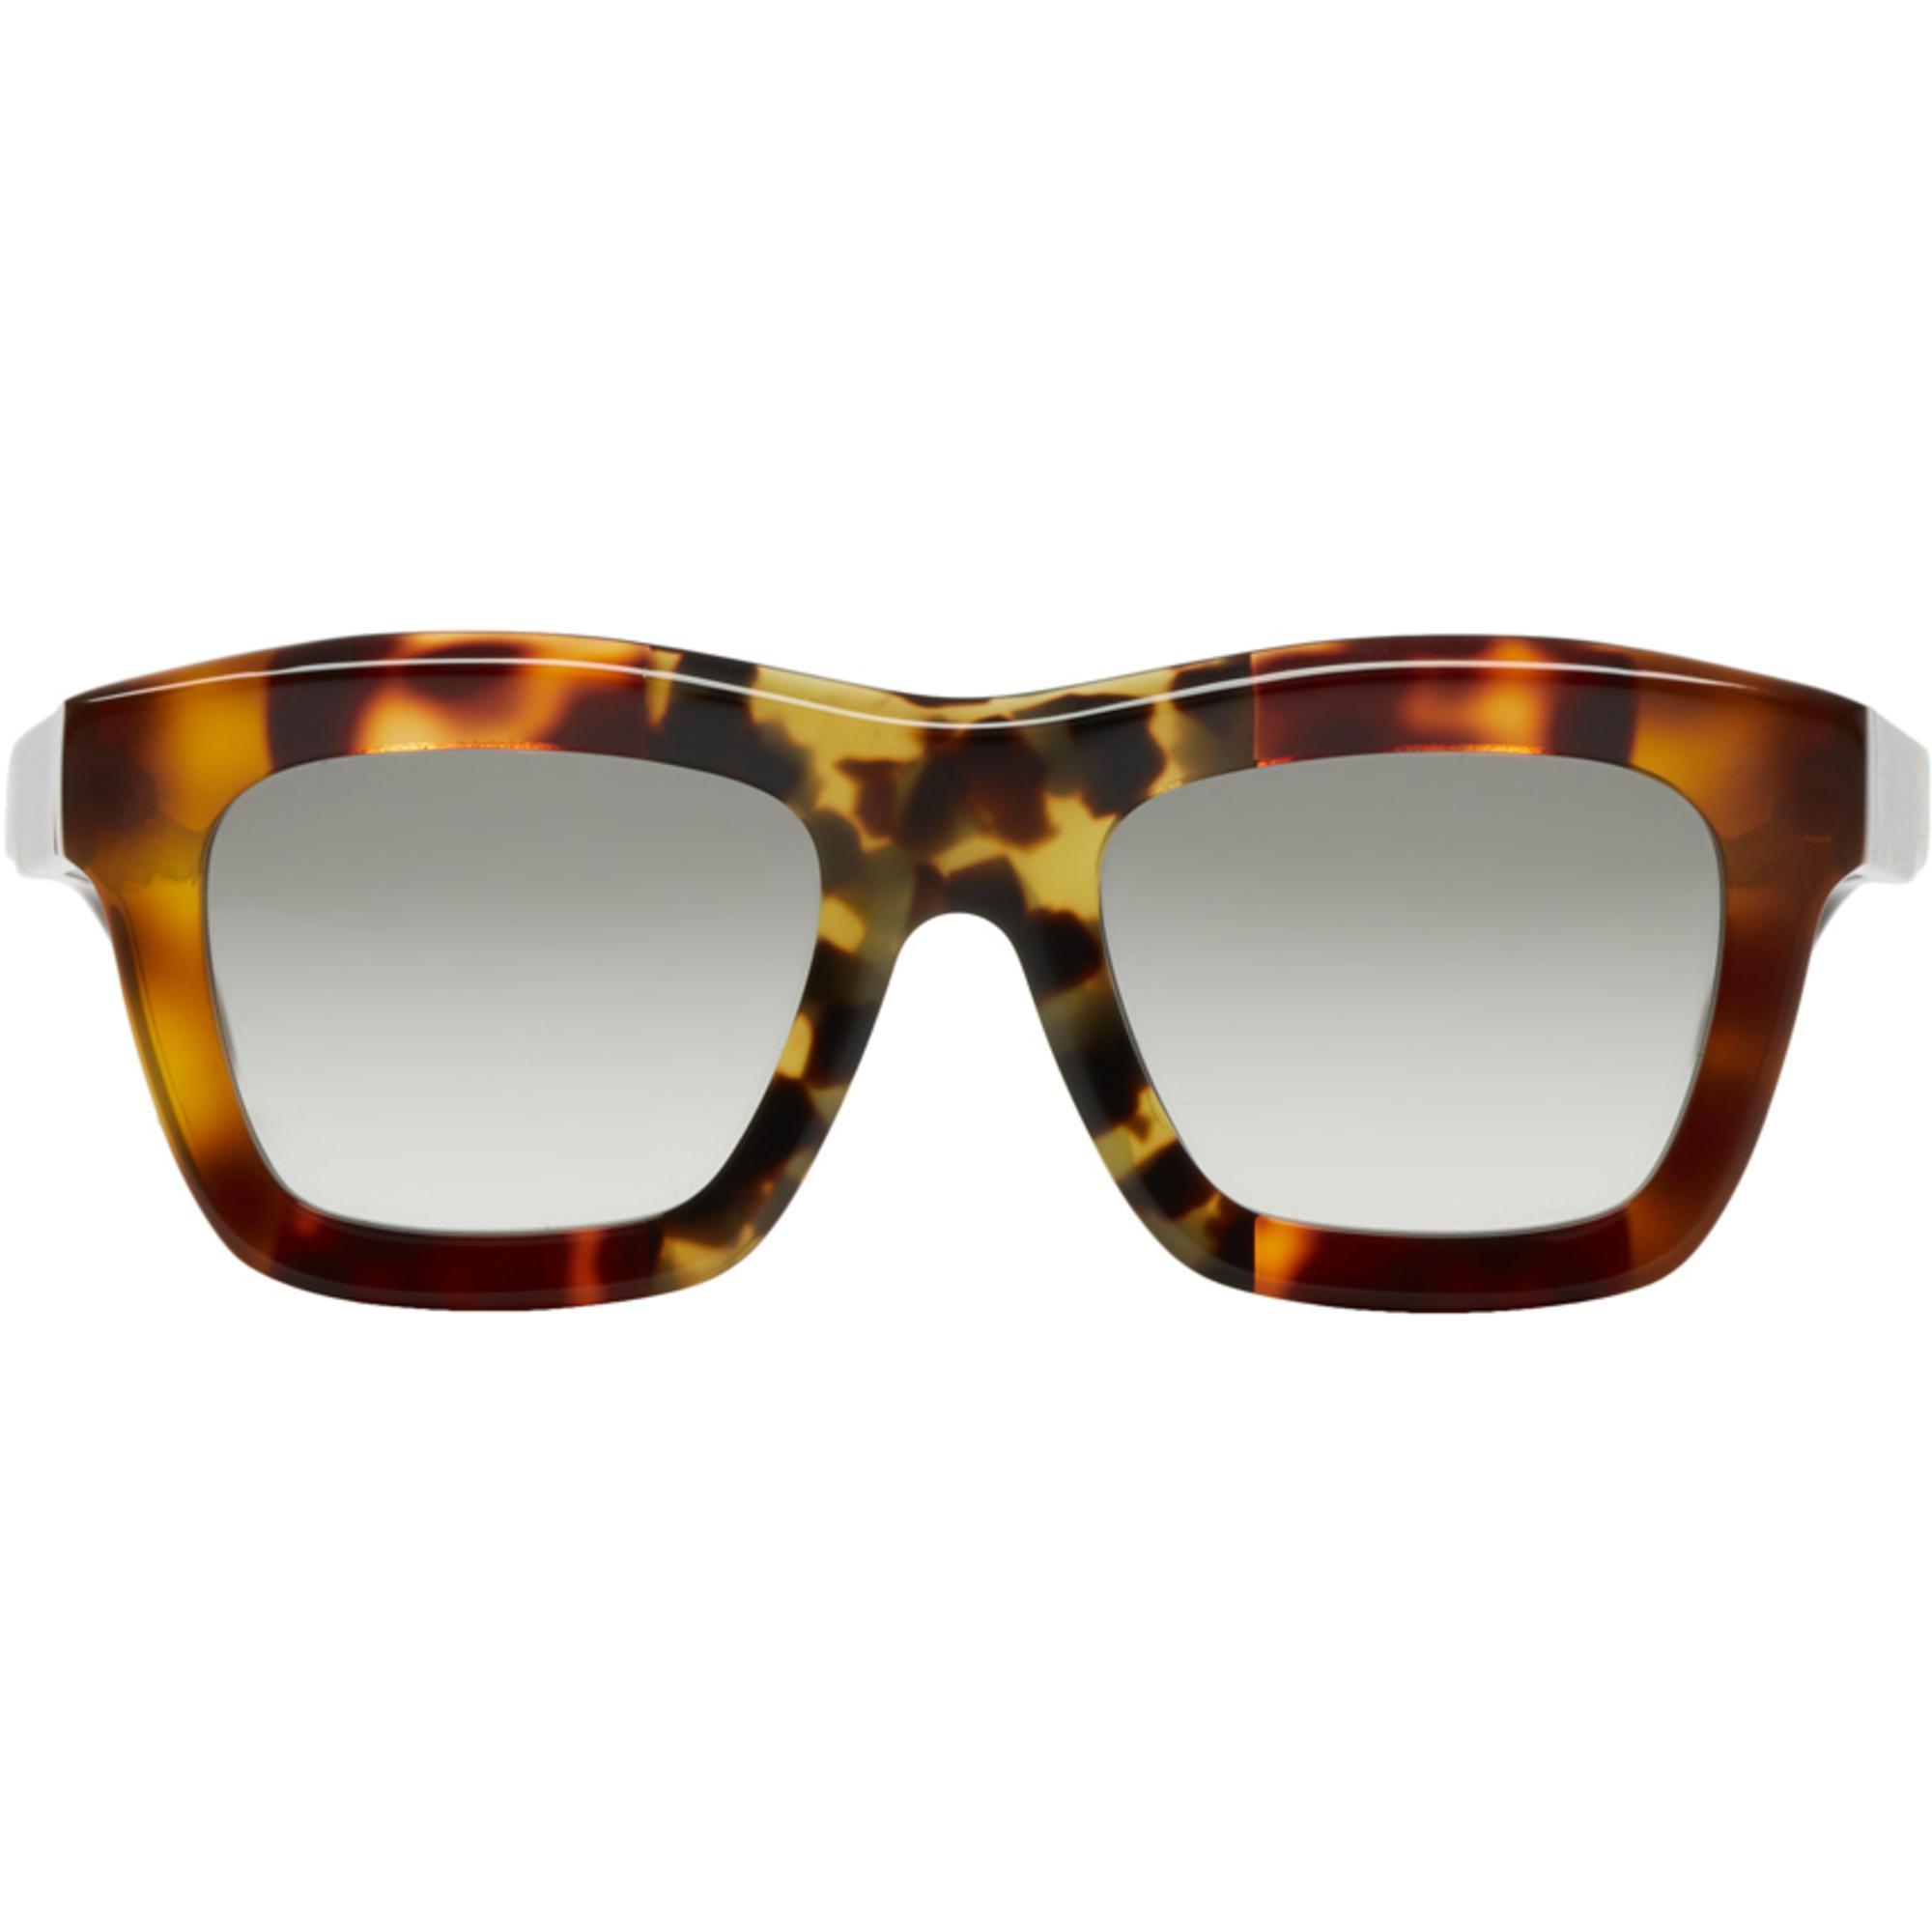 c75ee8137cf Kuboraum Tortoiseshell Mask C7 Sunglasses in Brown for Men - Lyst